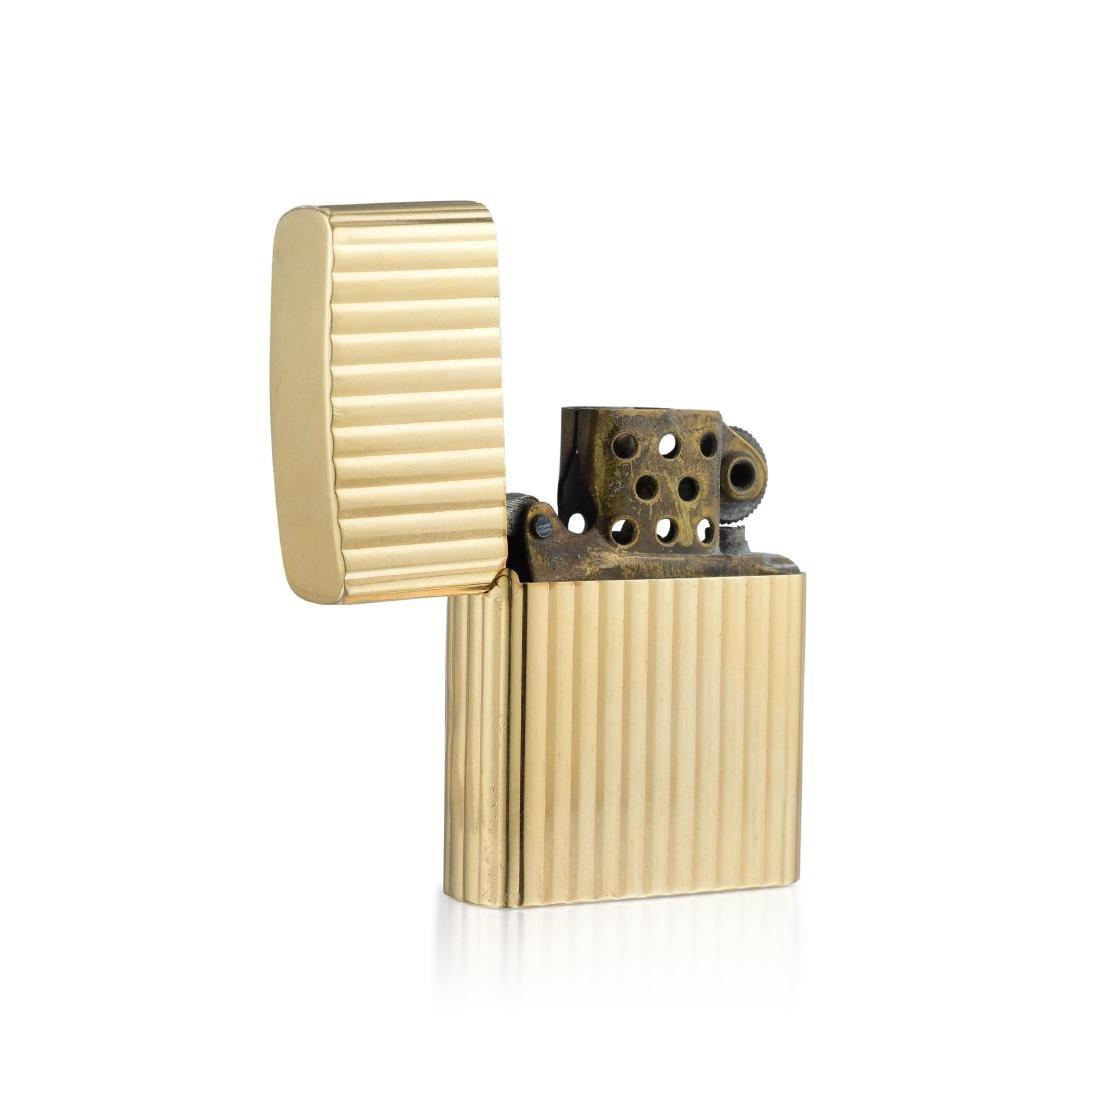 Tiffany & Co. Gold Zippo Lighter - 2